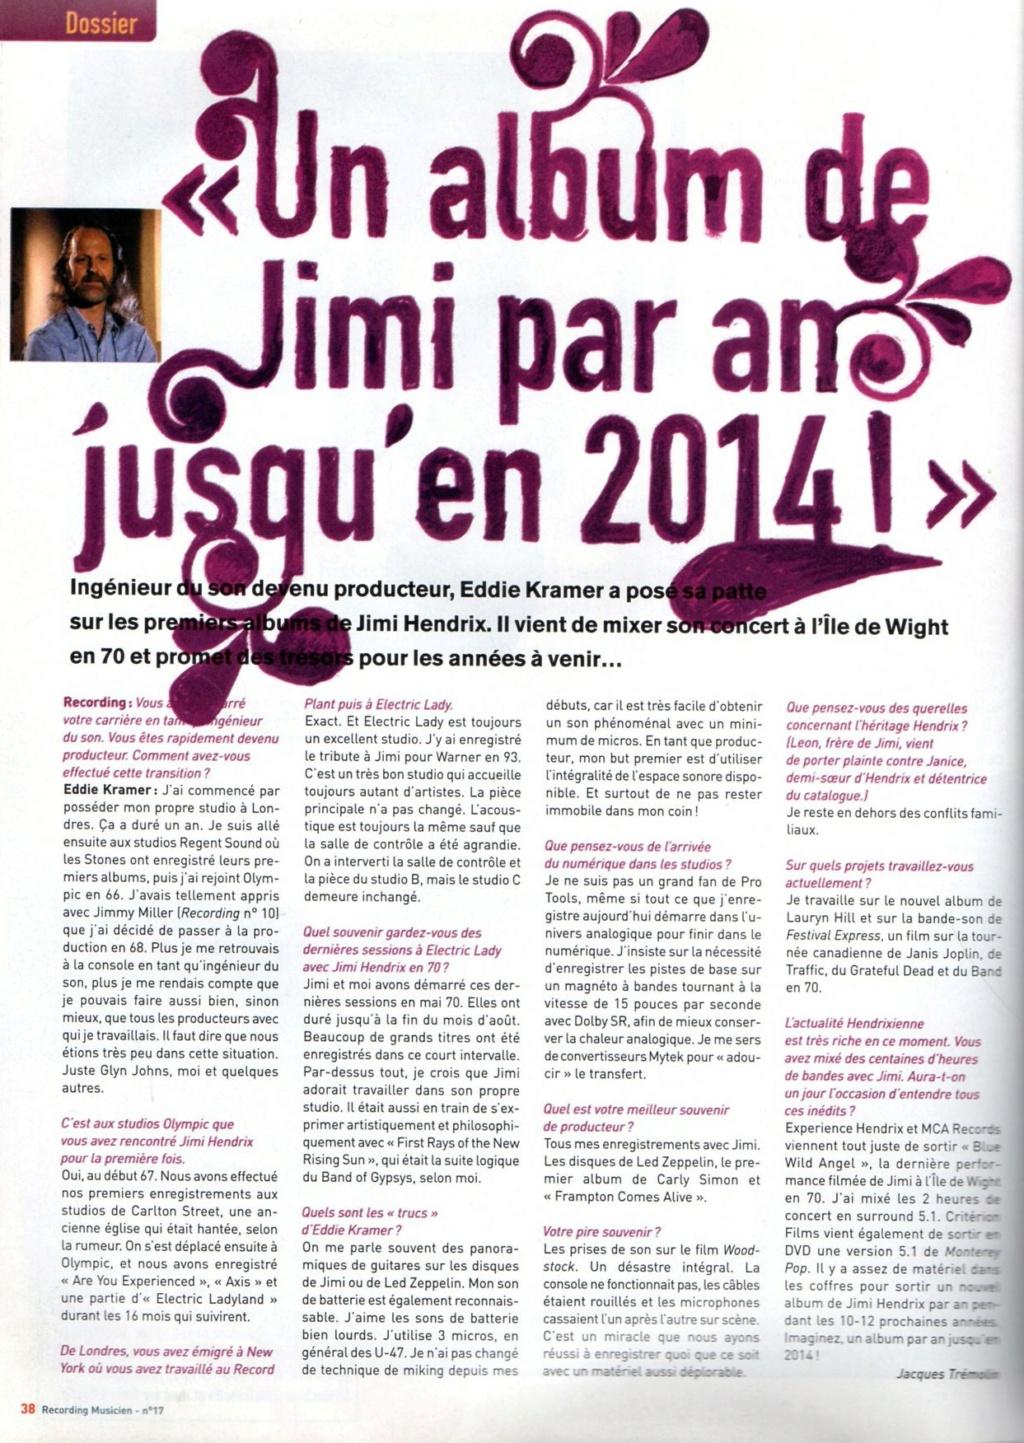 Magazines Français 1989 - 2014 - Page 2 Record17